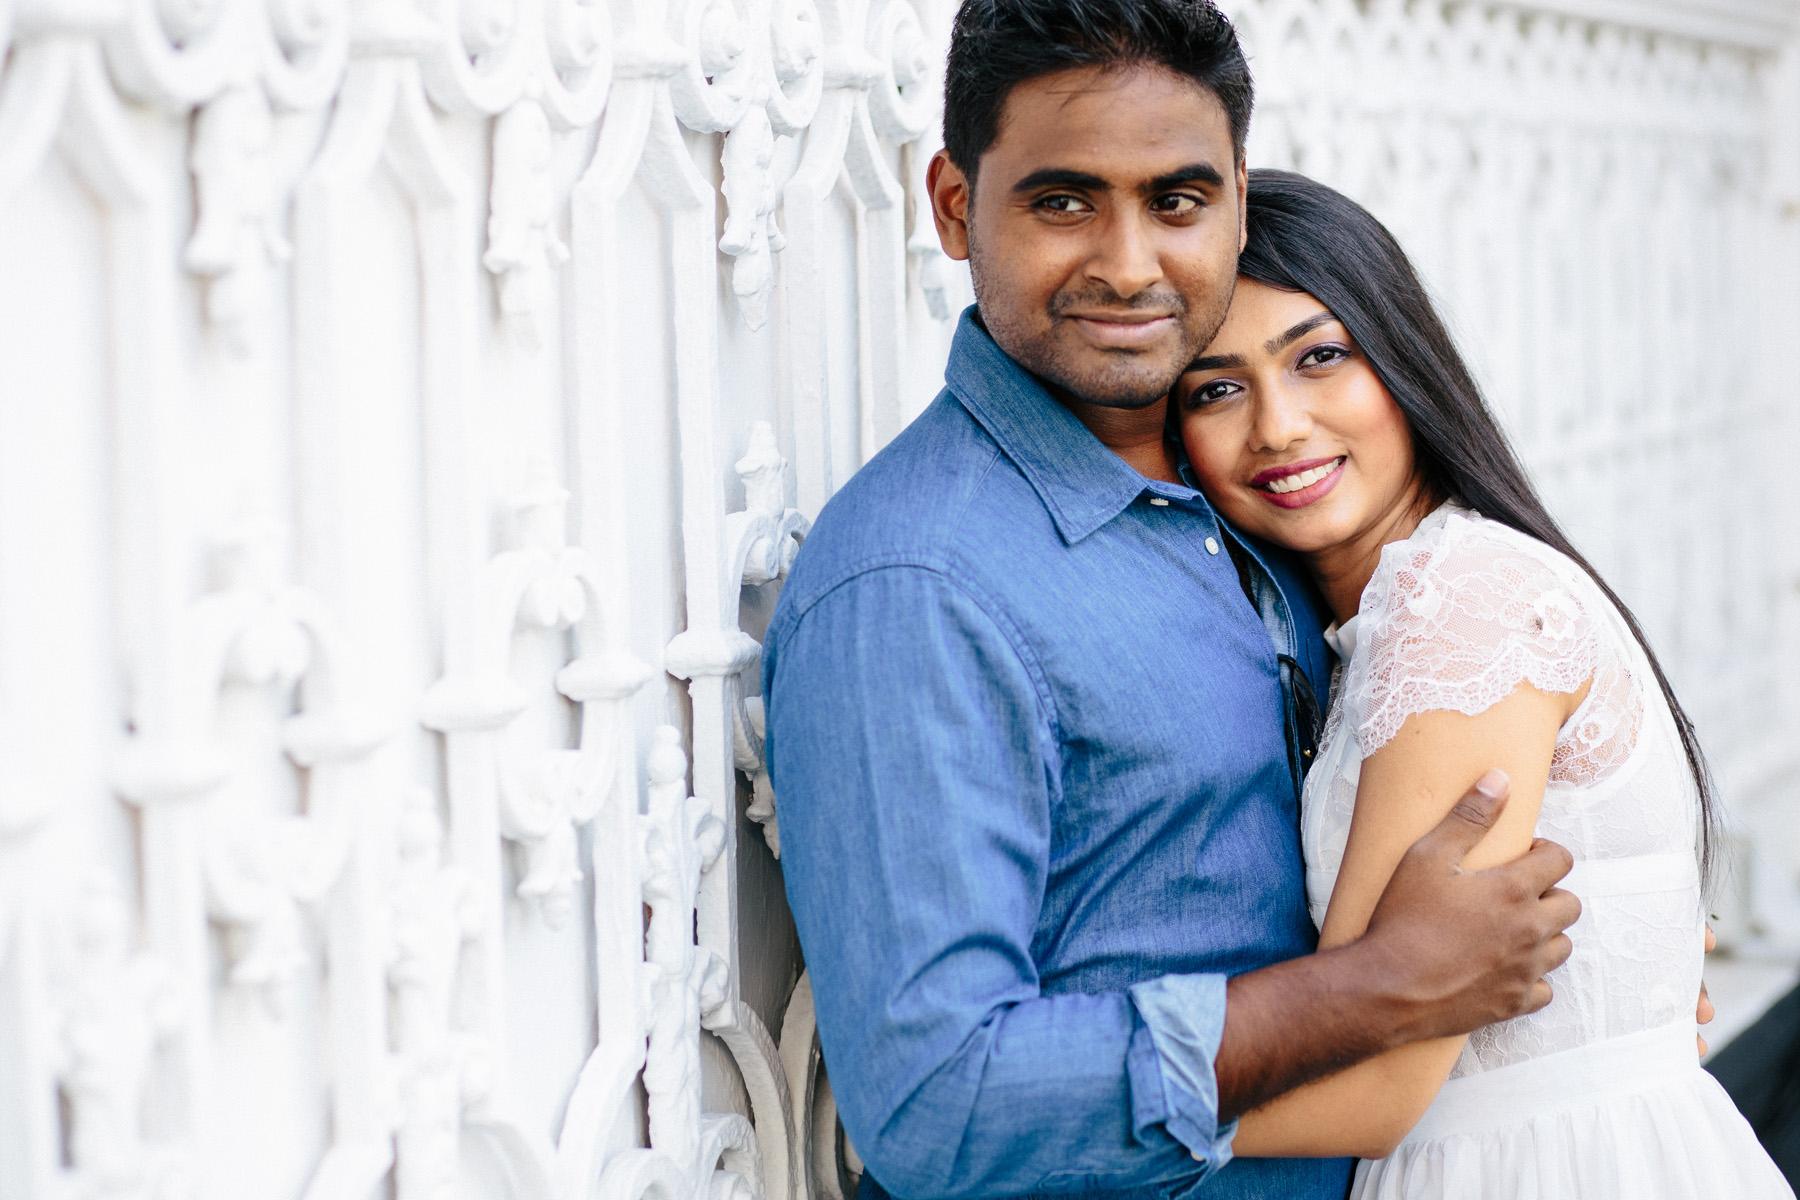 singapore-wedding-travel-photographer-abigail-caleb-wedding-wmt-06.jpg